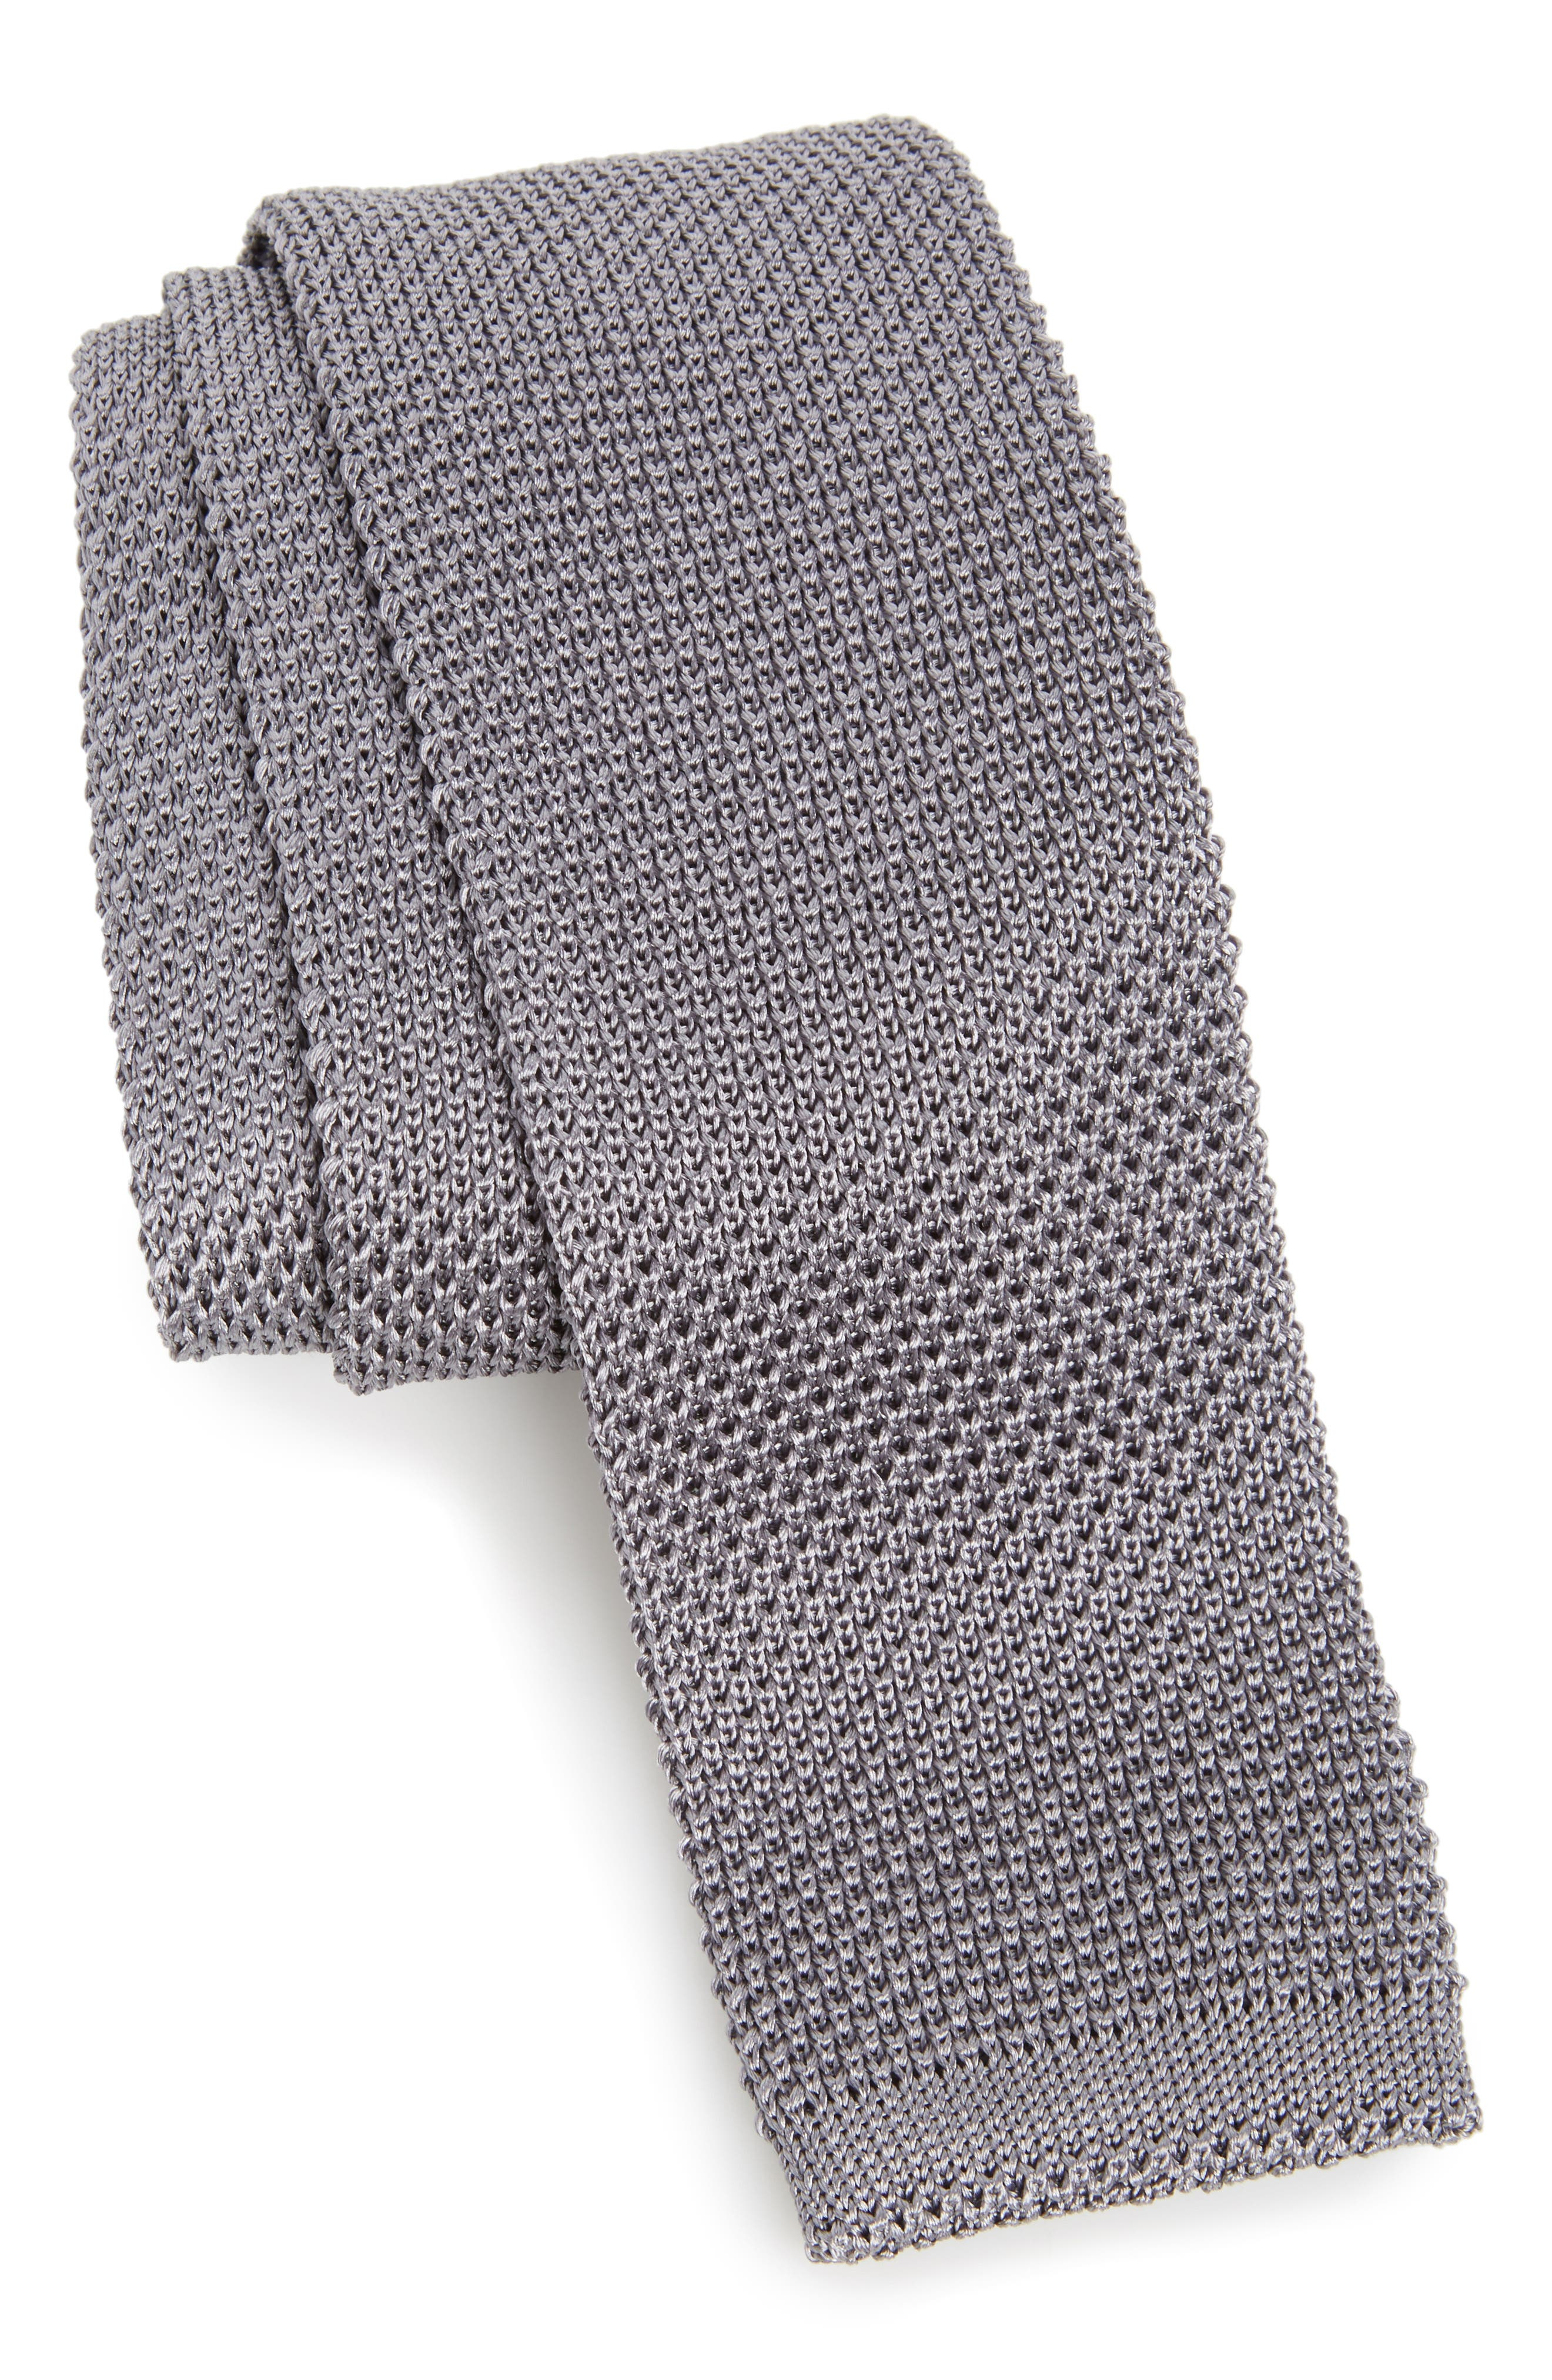 Stuart Silk Knit Tie,                         Main,                         color, Grey